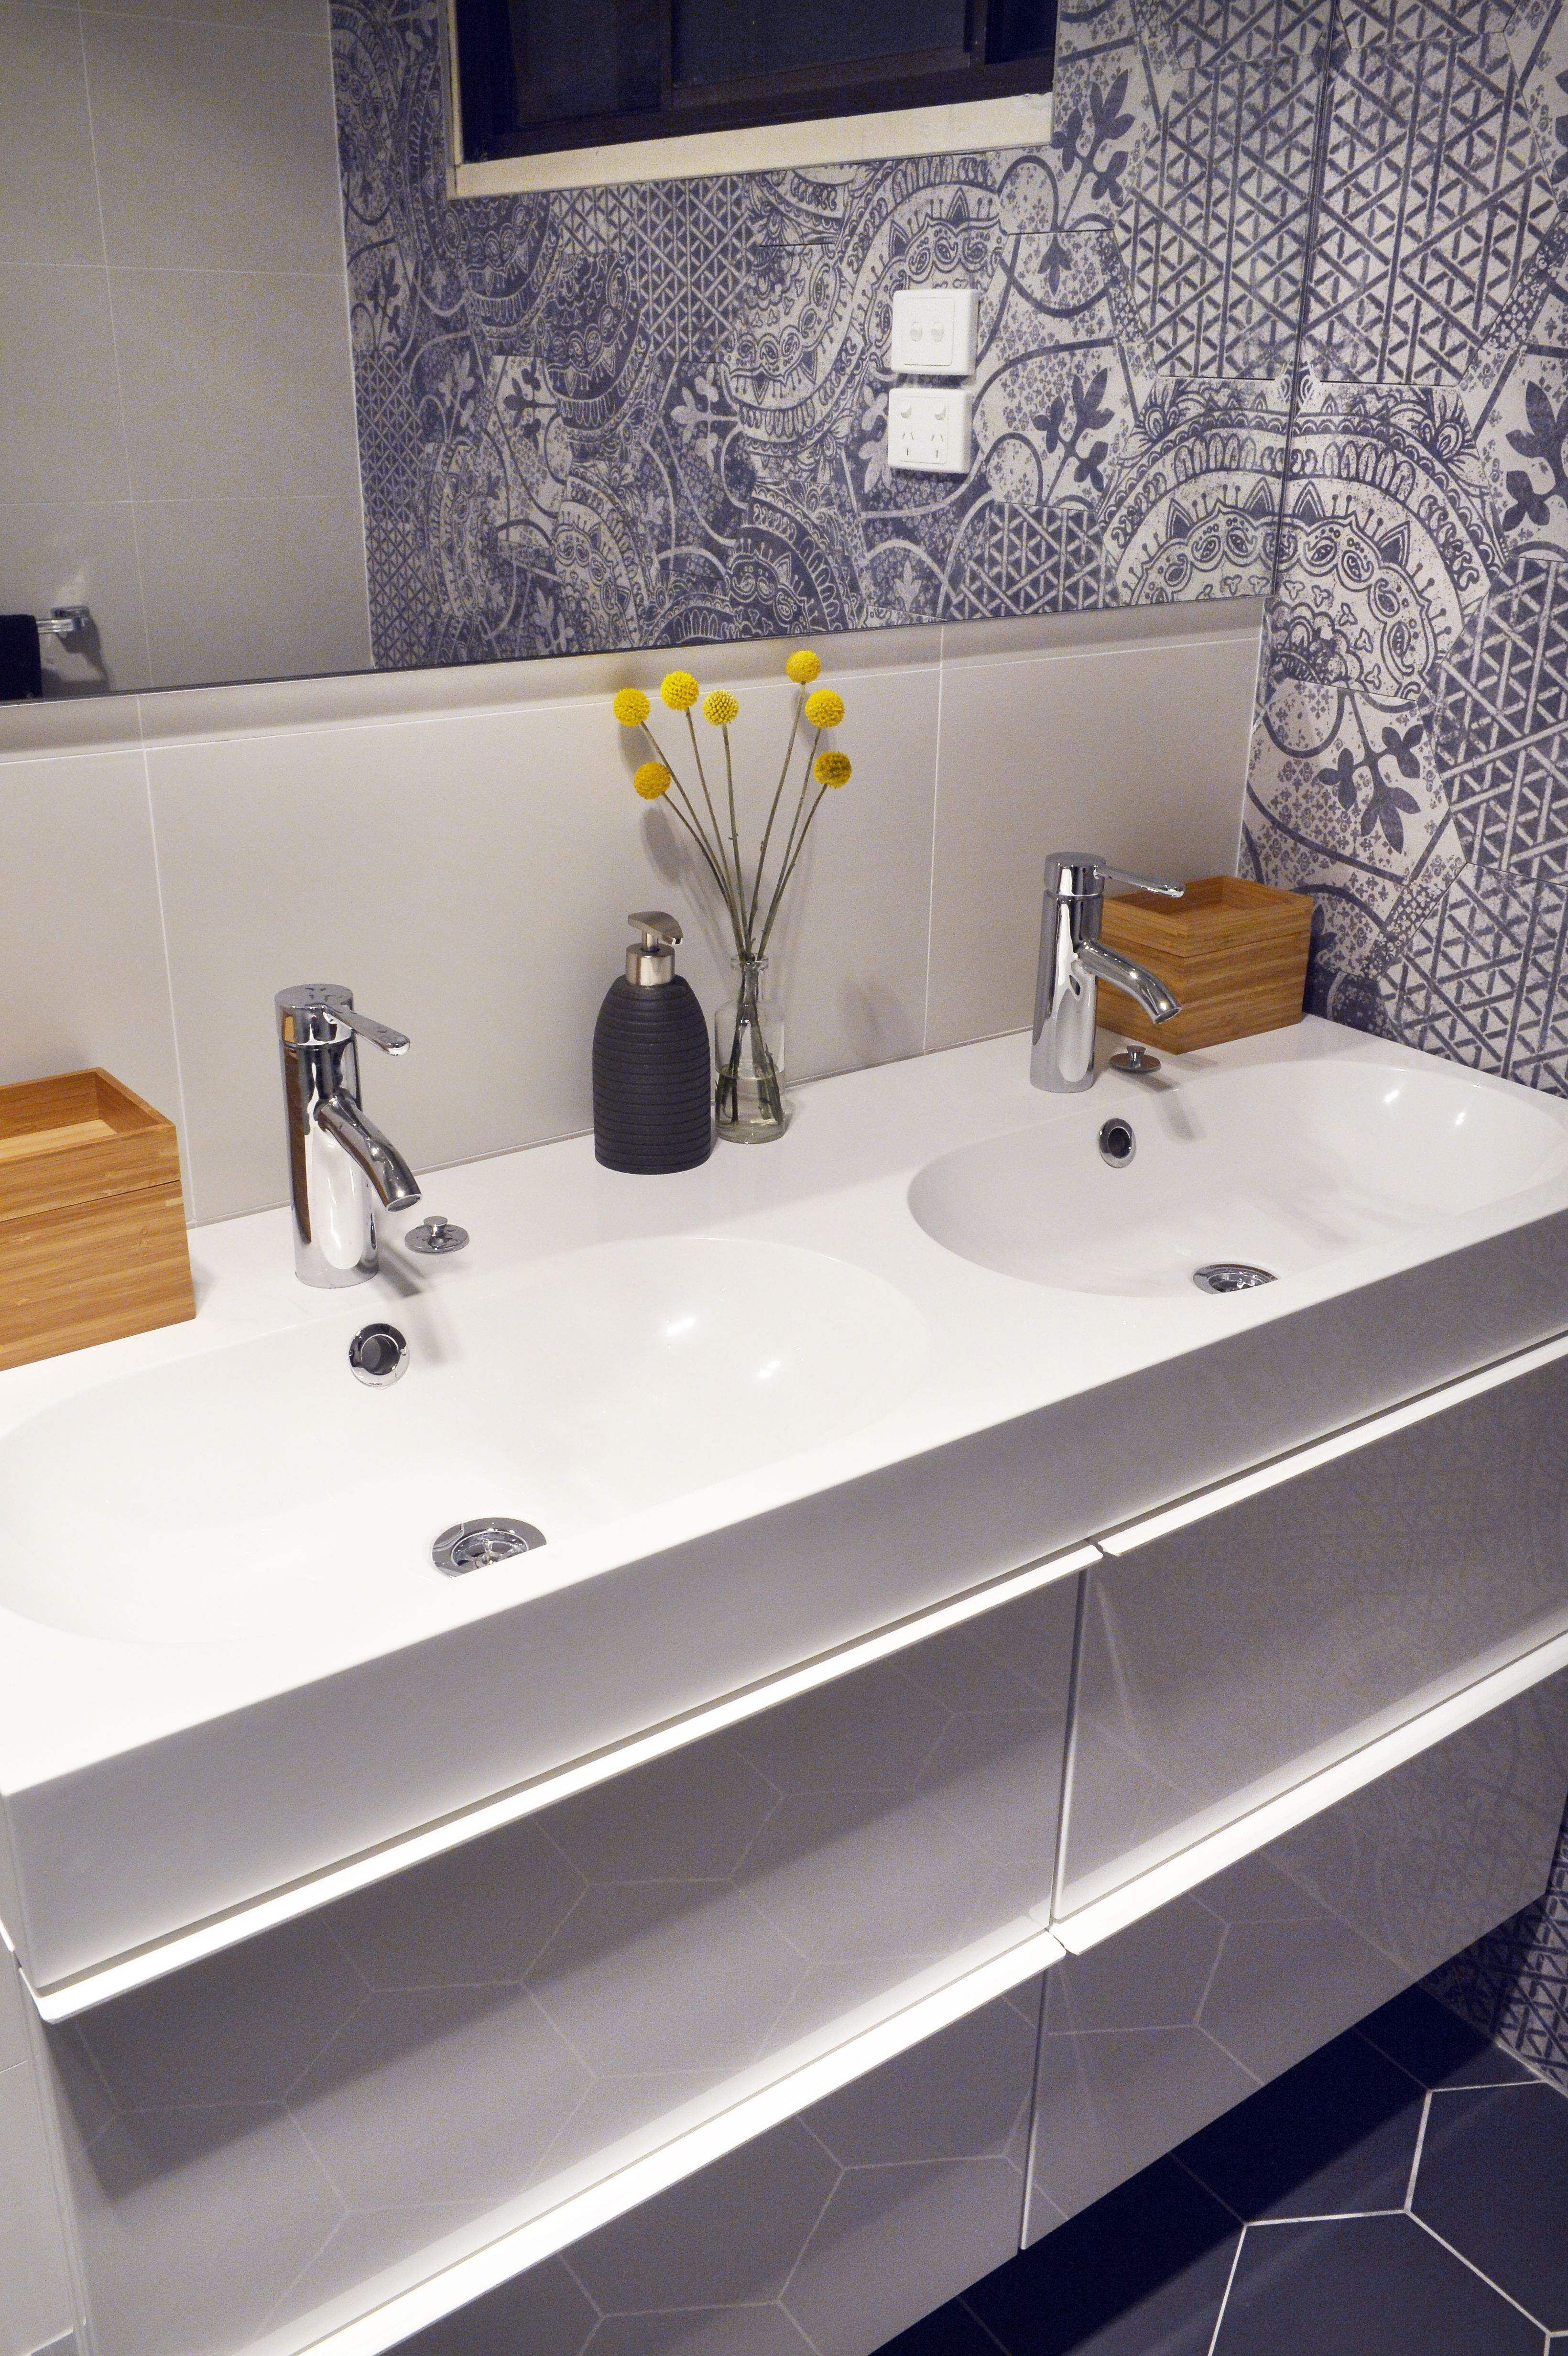 Bathroom Fixtures Geelong quintessenza alchimia bianco nero hexagon mix & alchimia nero